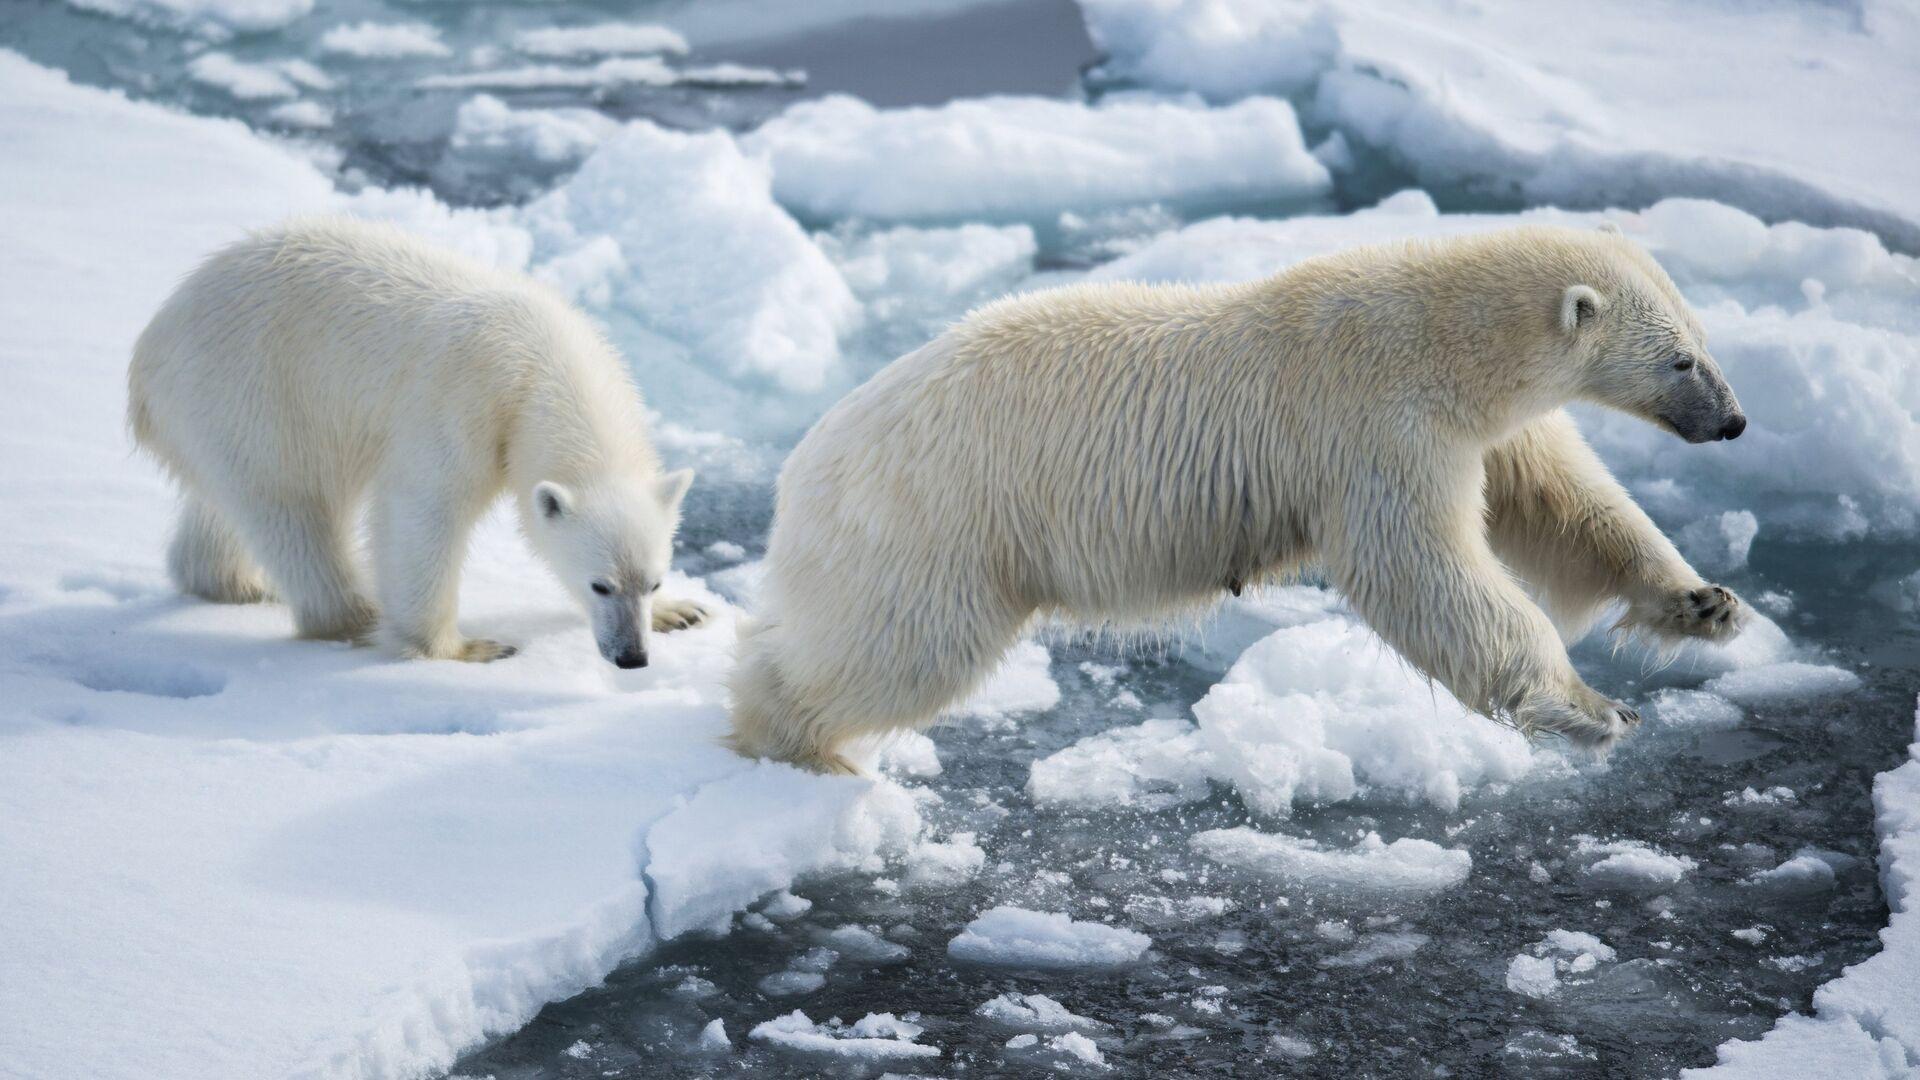 Белая медведица с медвежонком в районе архипелага Земля Франца Иосифа в Баренцевом море - РИА Новости, 1920, 30.07.2021